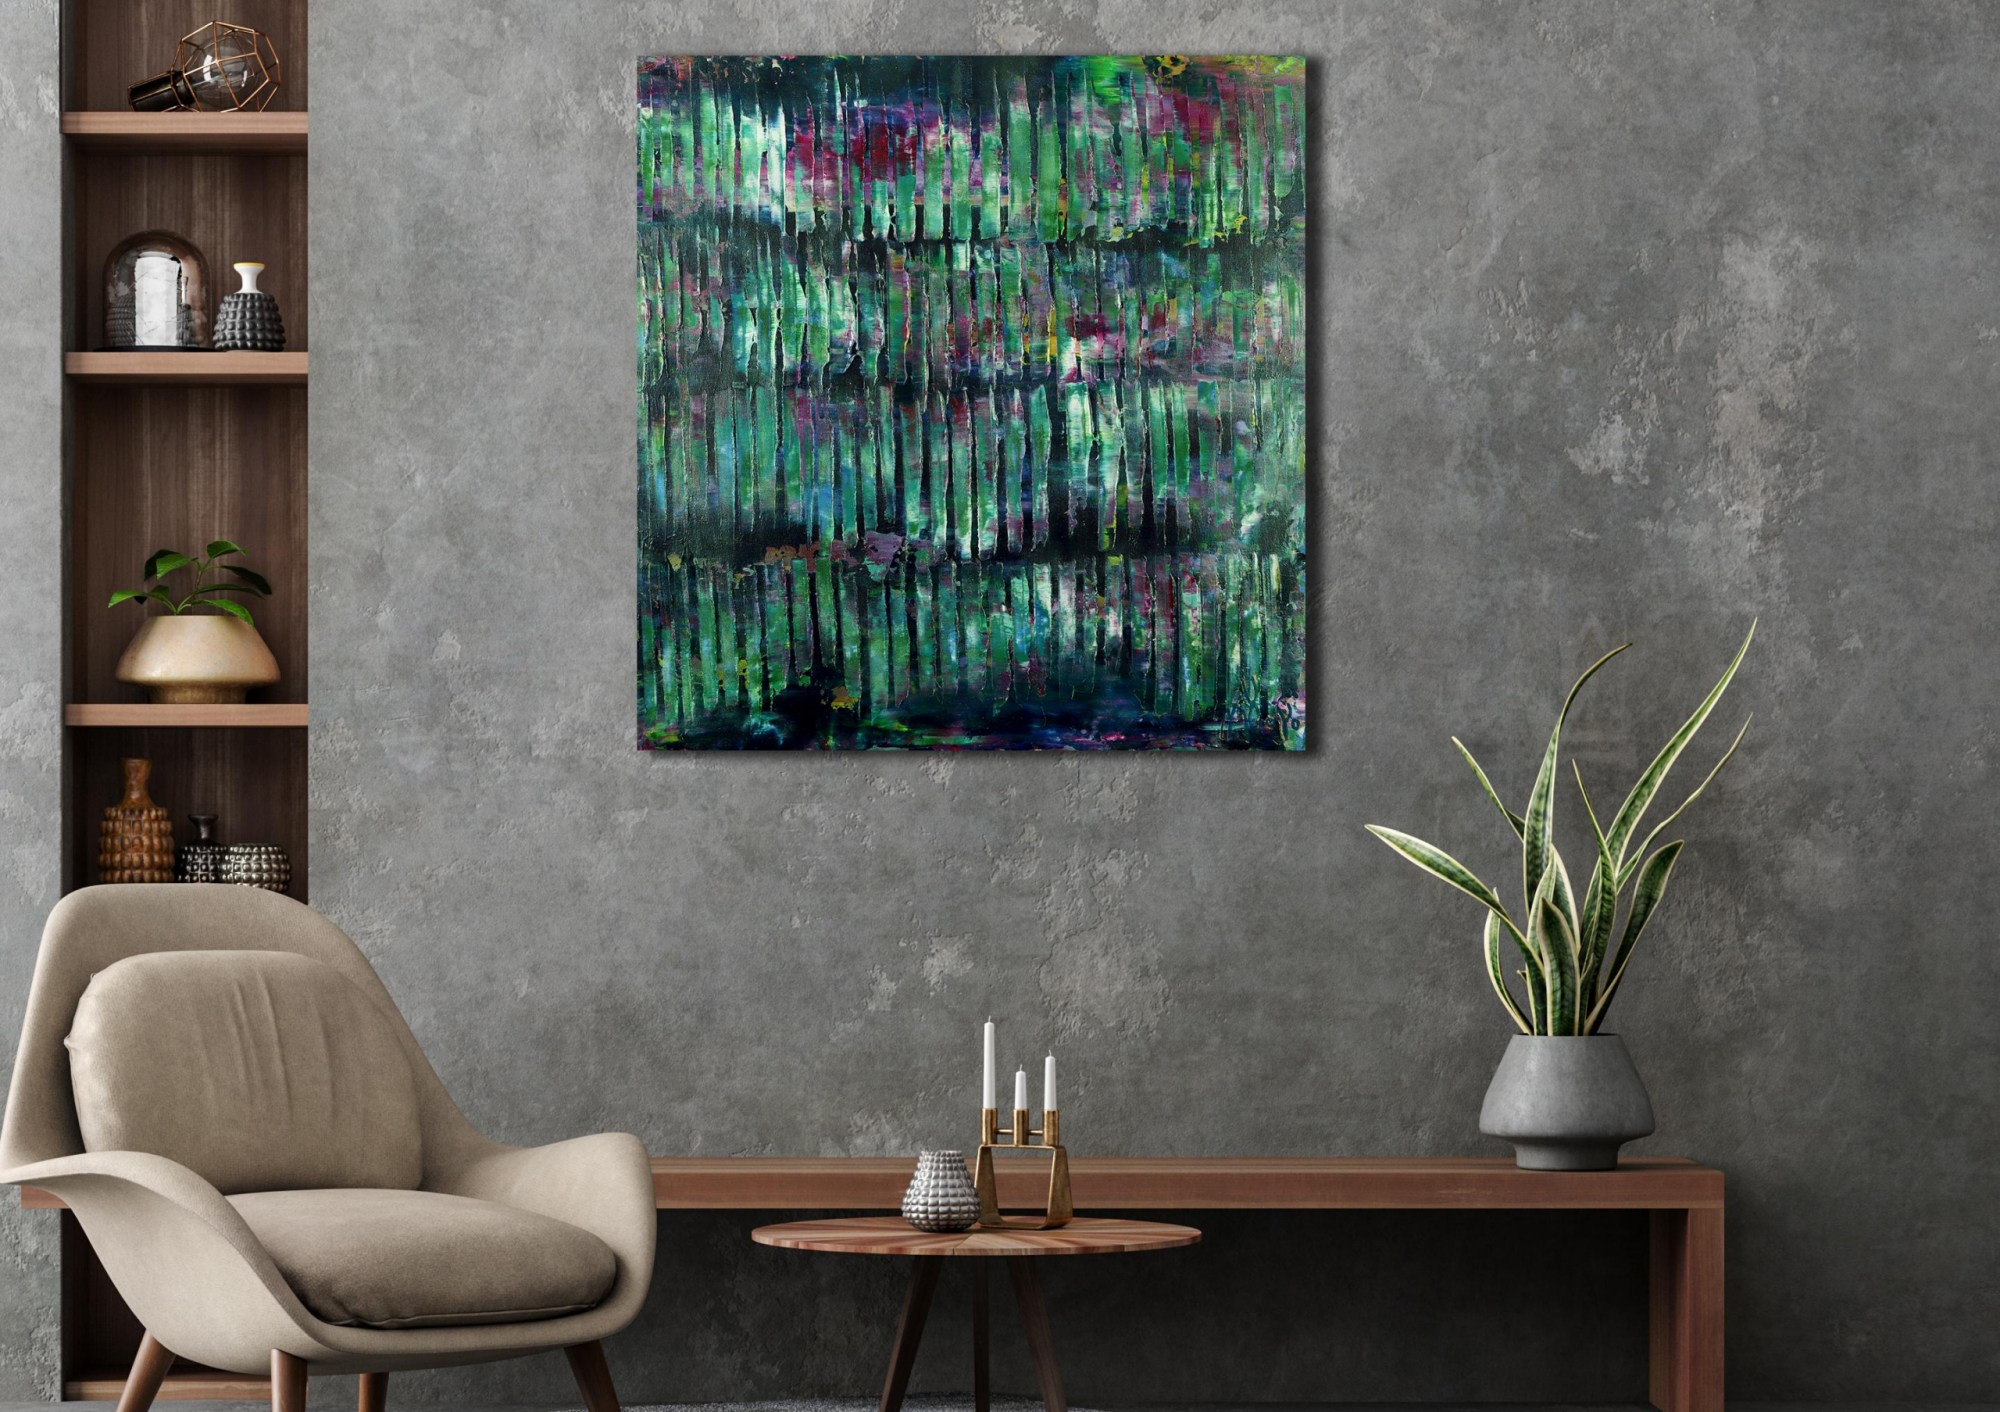 Iridescent Green Forest 1 (2021) by Nestor Toro